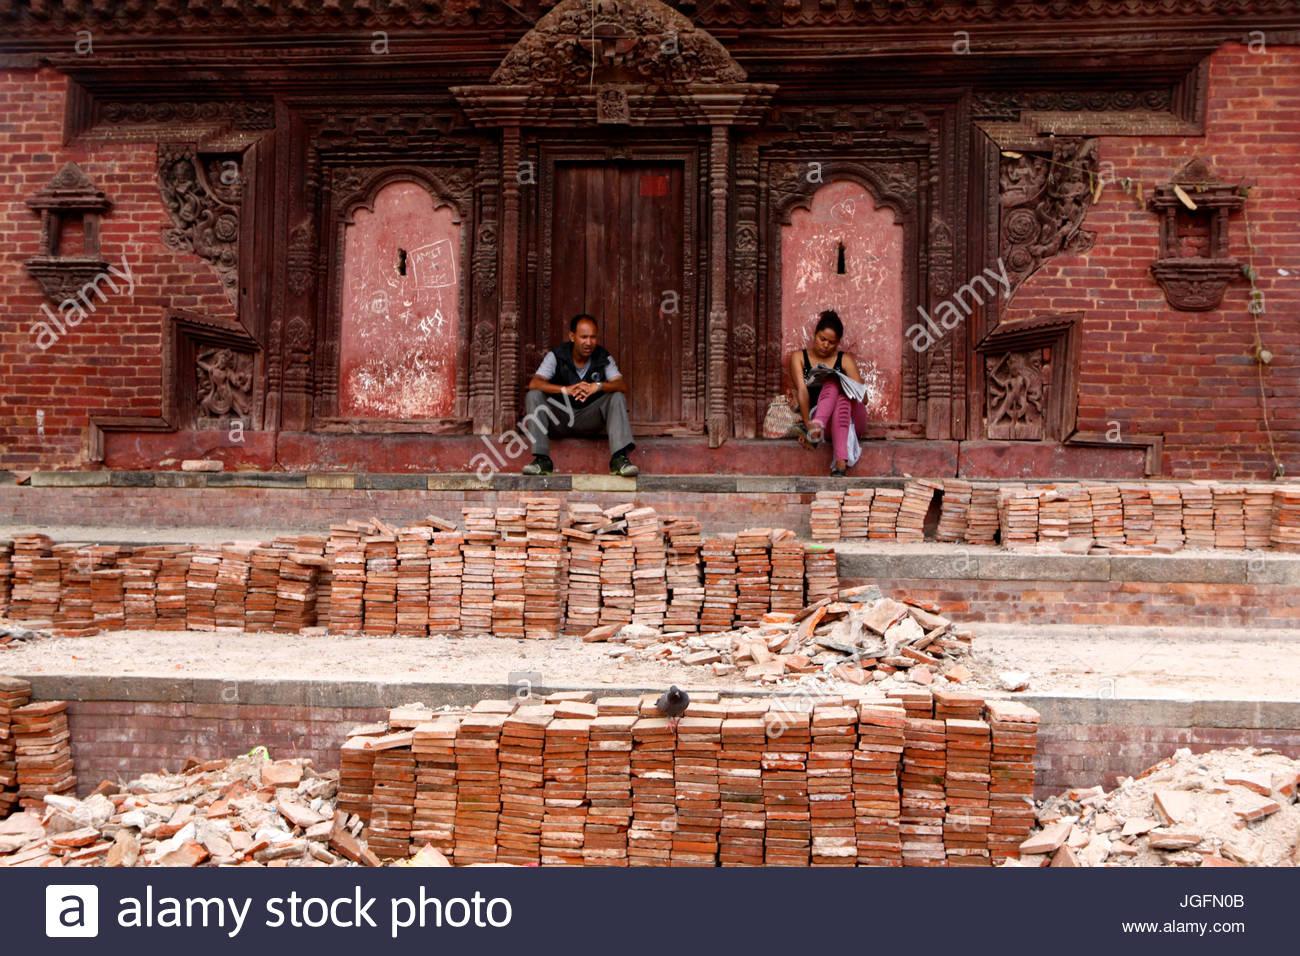 People sit amongst the bricks in Kathmandu's Durbar Square. - Stock Image